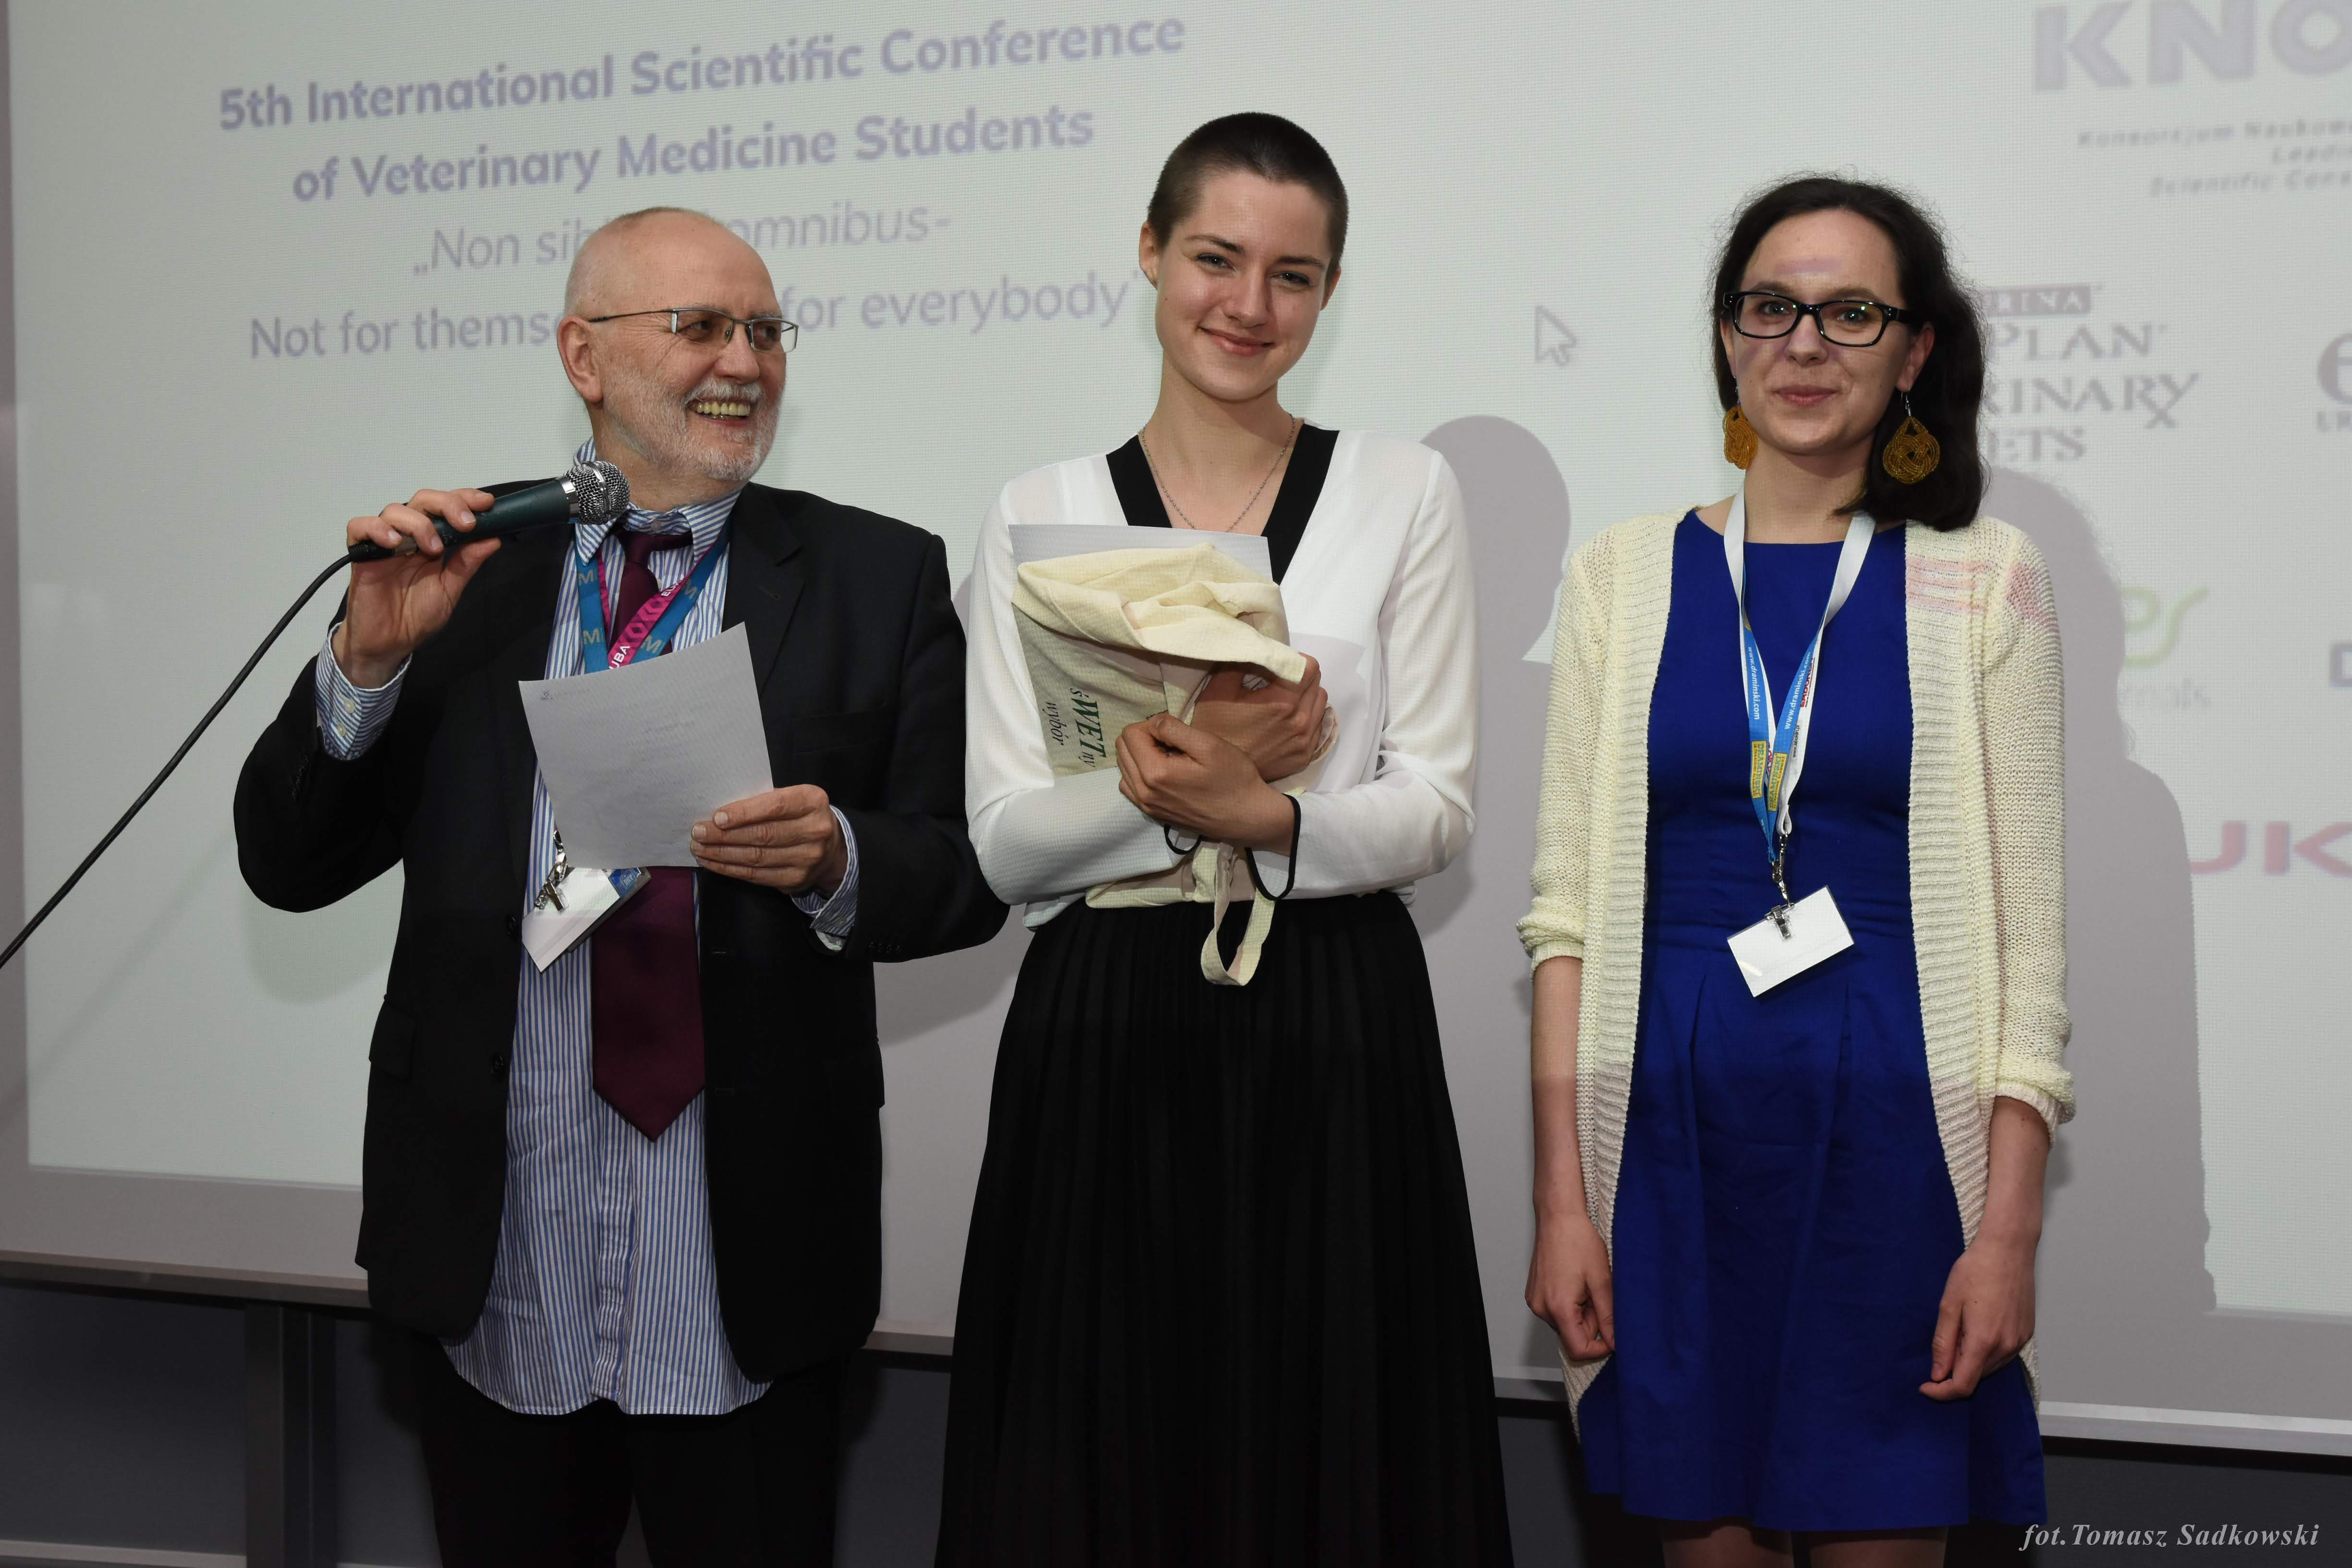 Magdalena Walczak awarded in wildlife&exotic sciences session